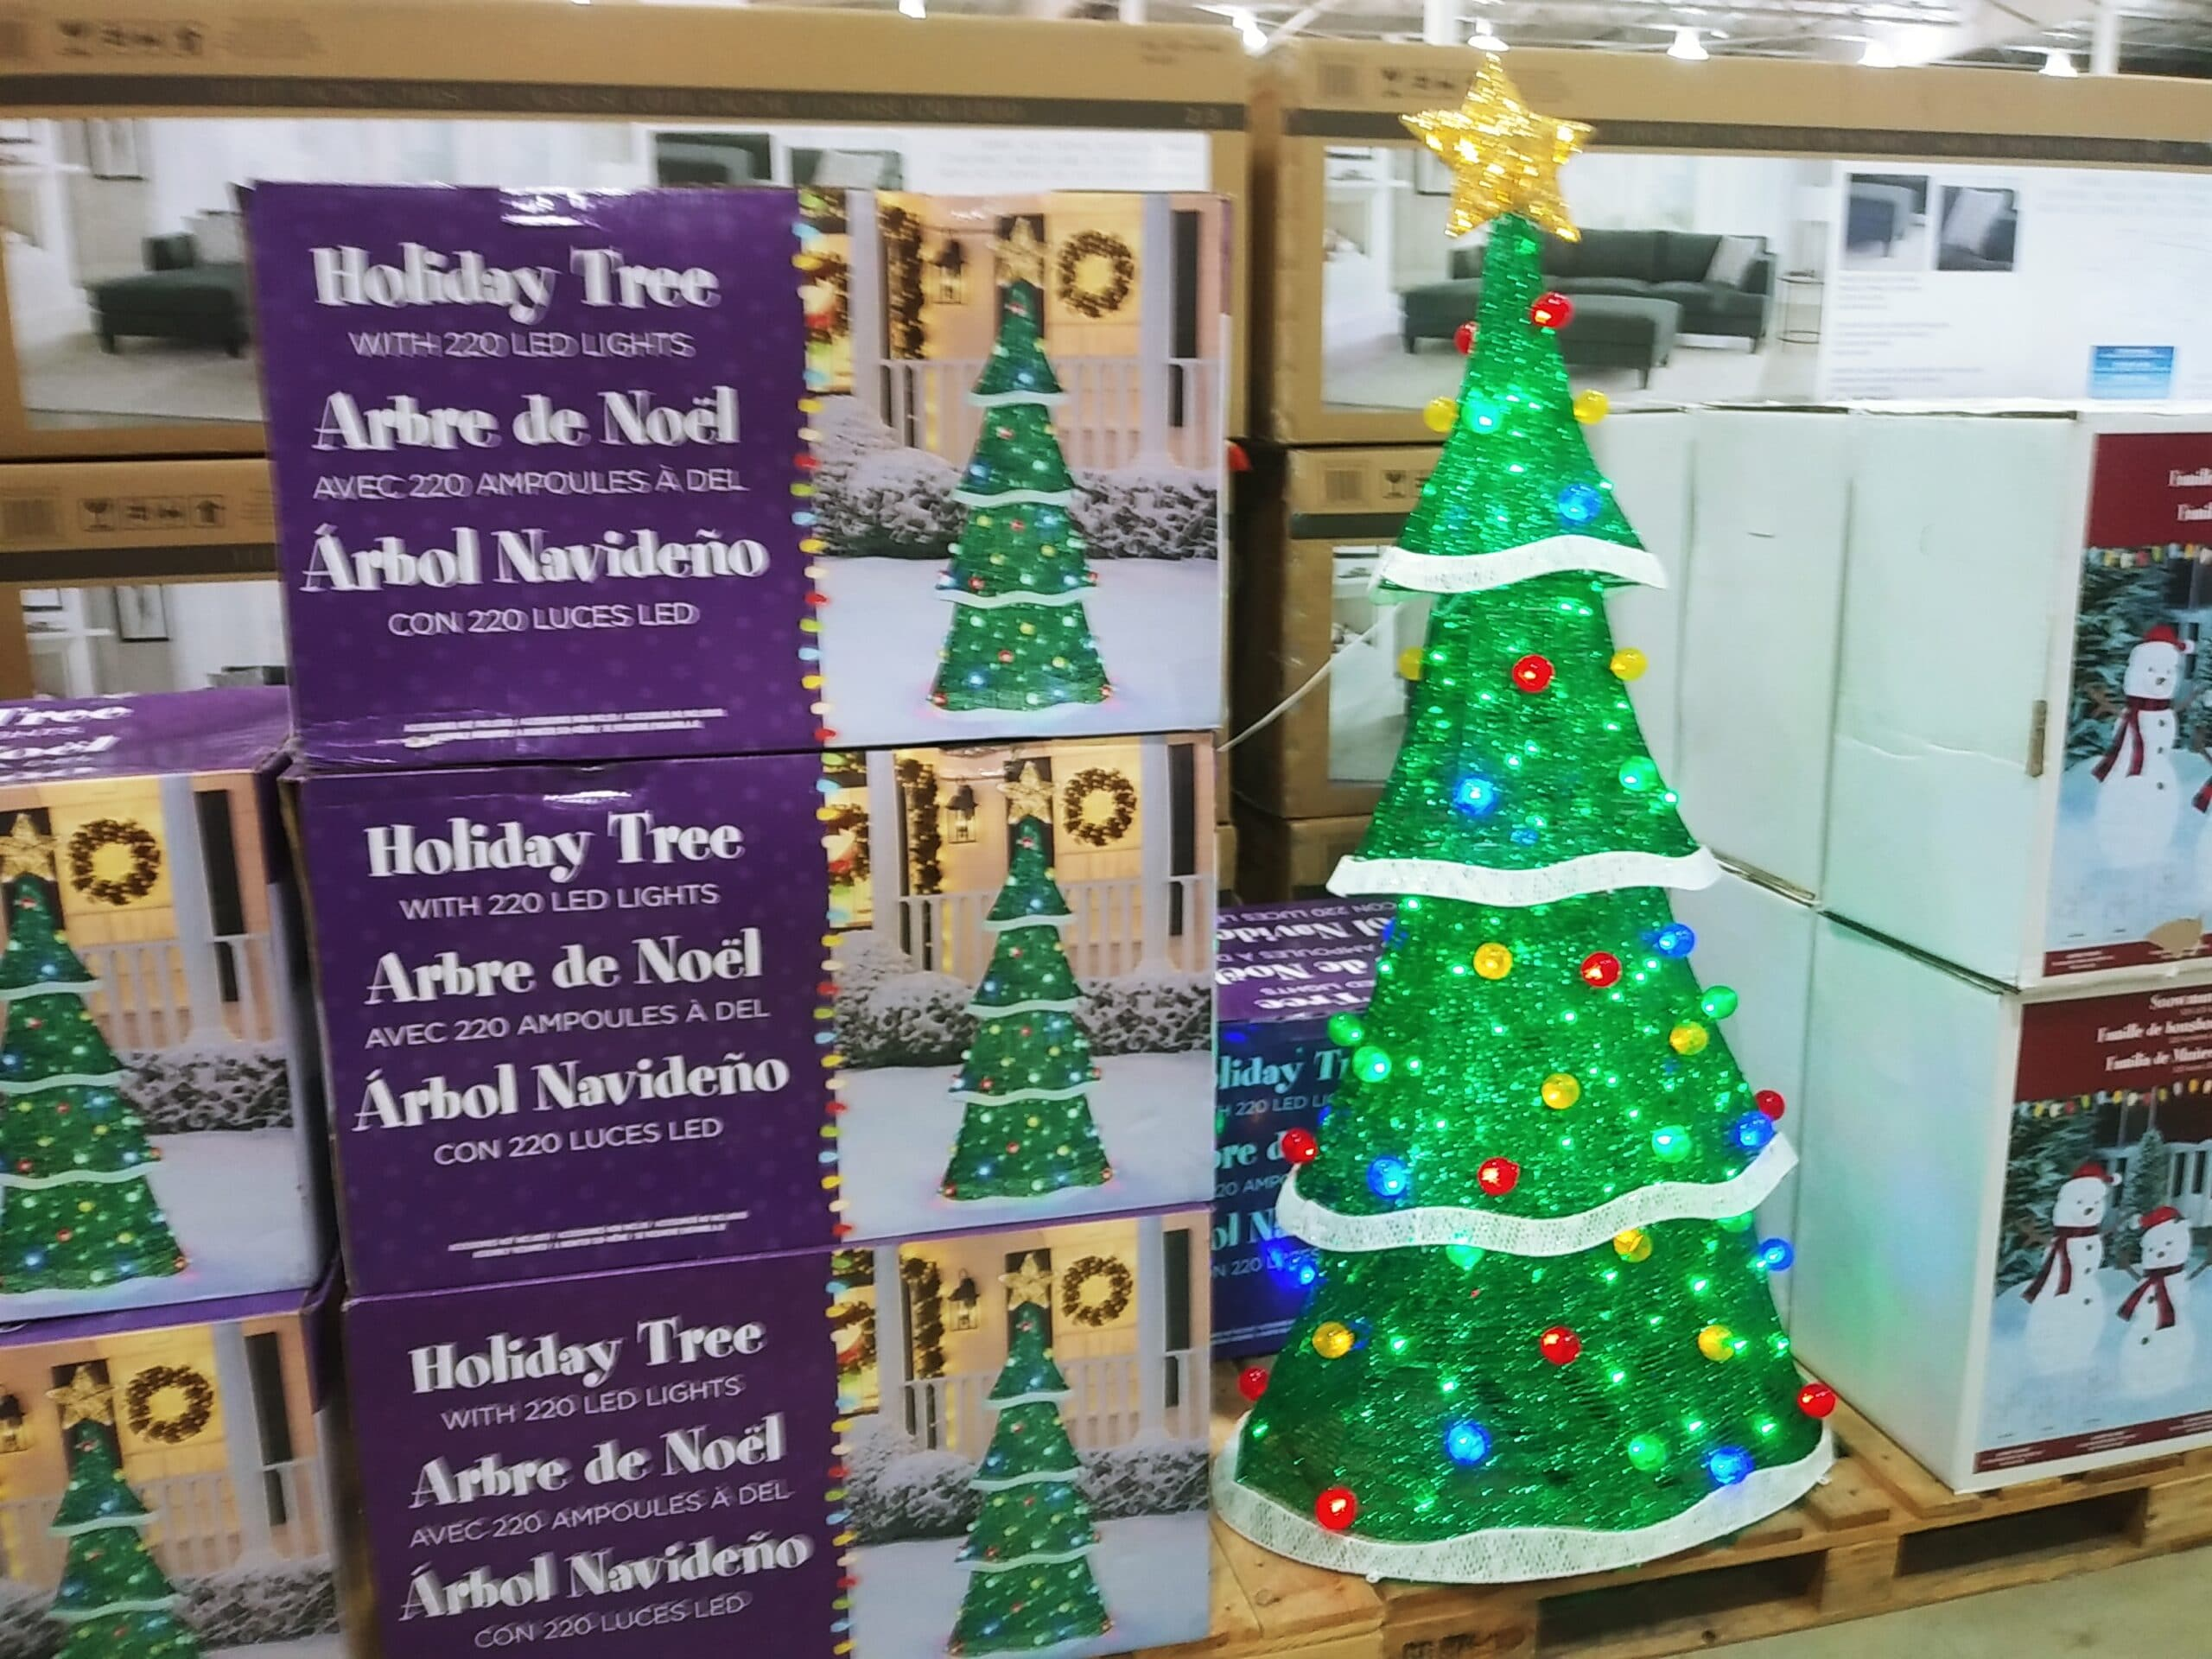 72 inch Holiday Tree 220 LED Lights $109.99